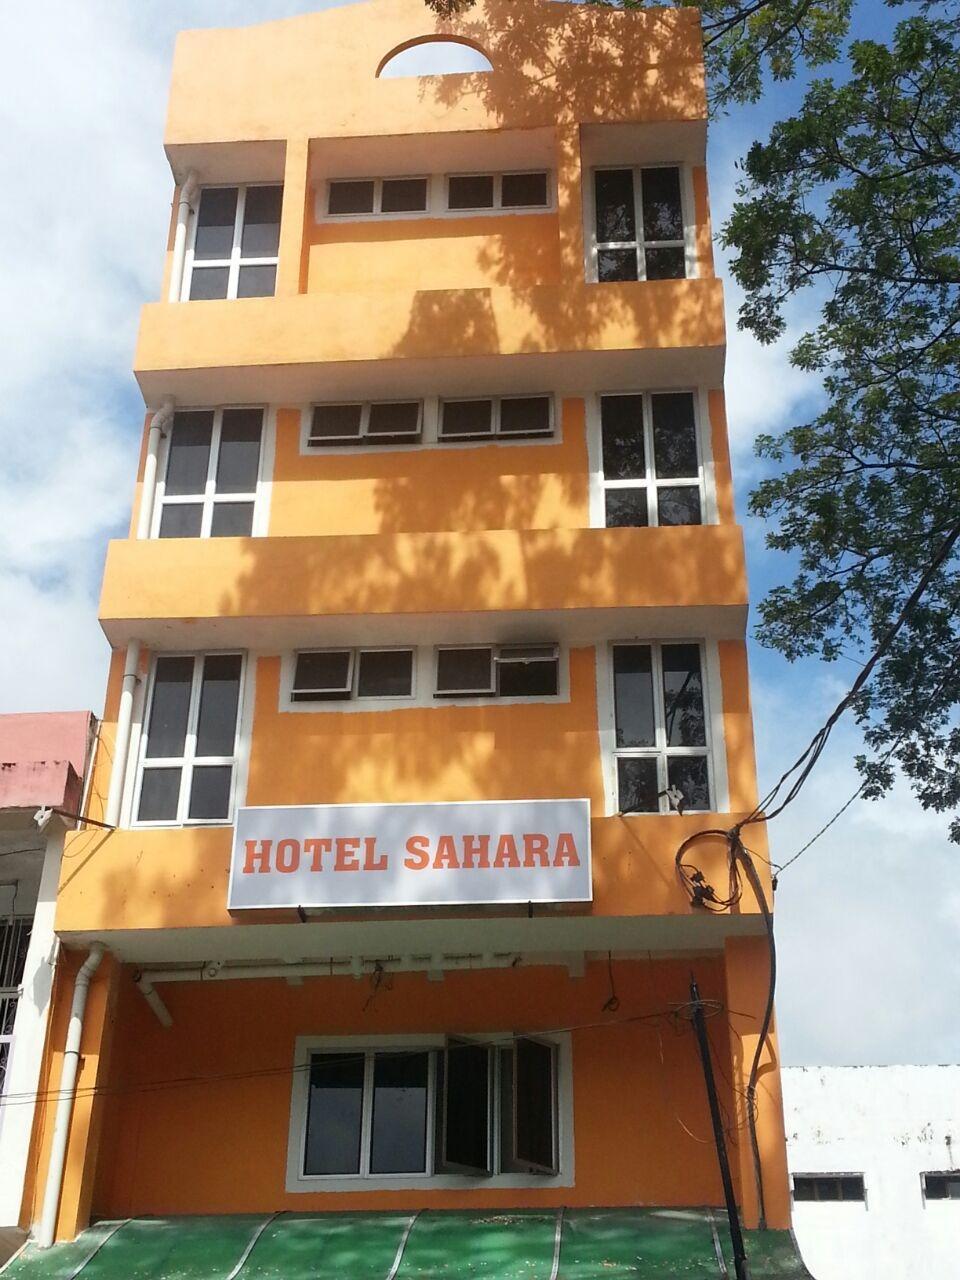 Hotel Sahara Kuala Kubu Bharu, Hulu Selangor